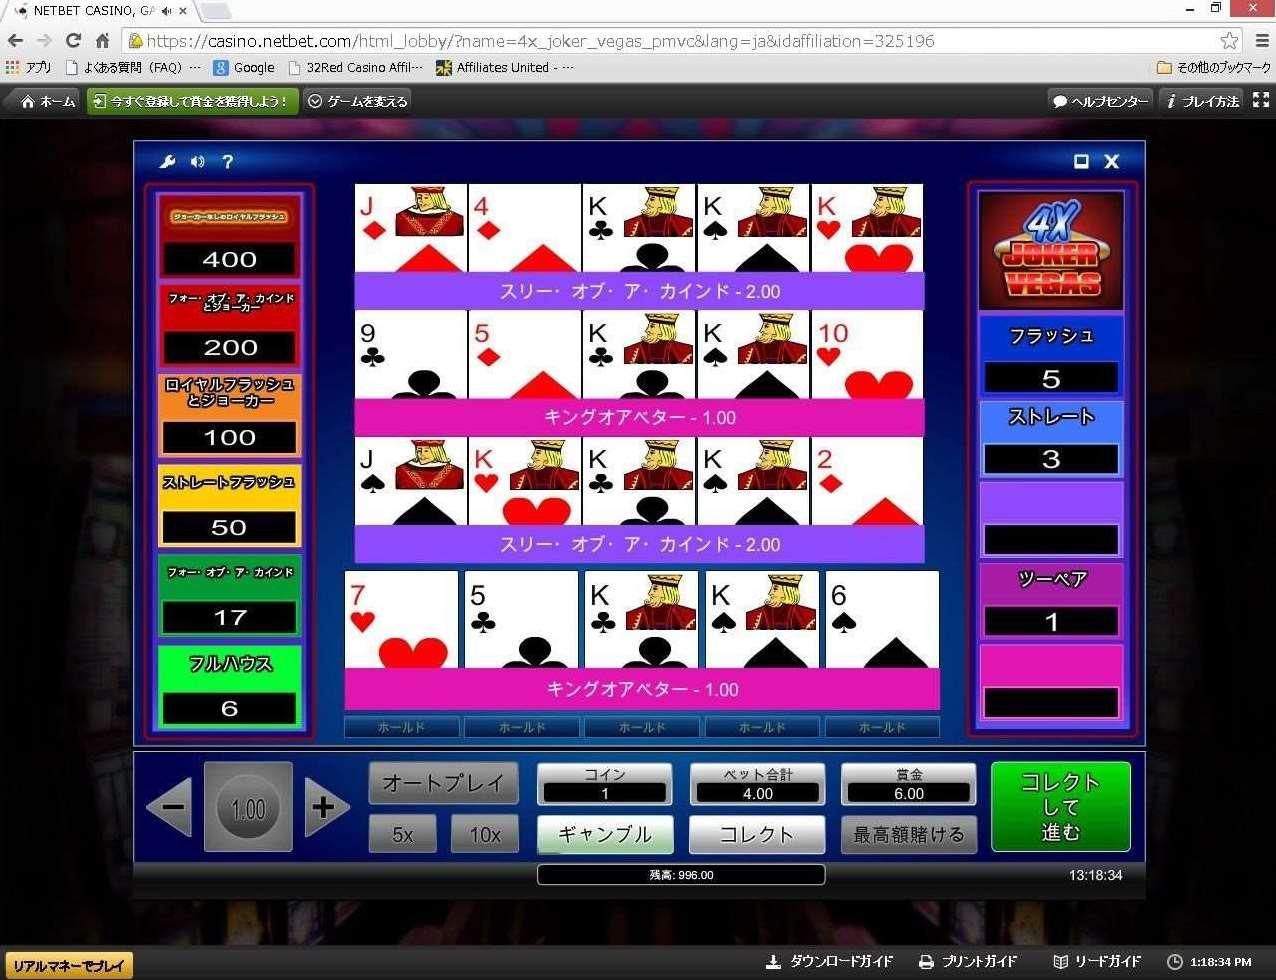 isoftbet 4x Vegas Joker3